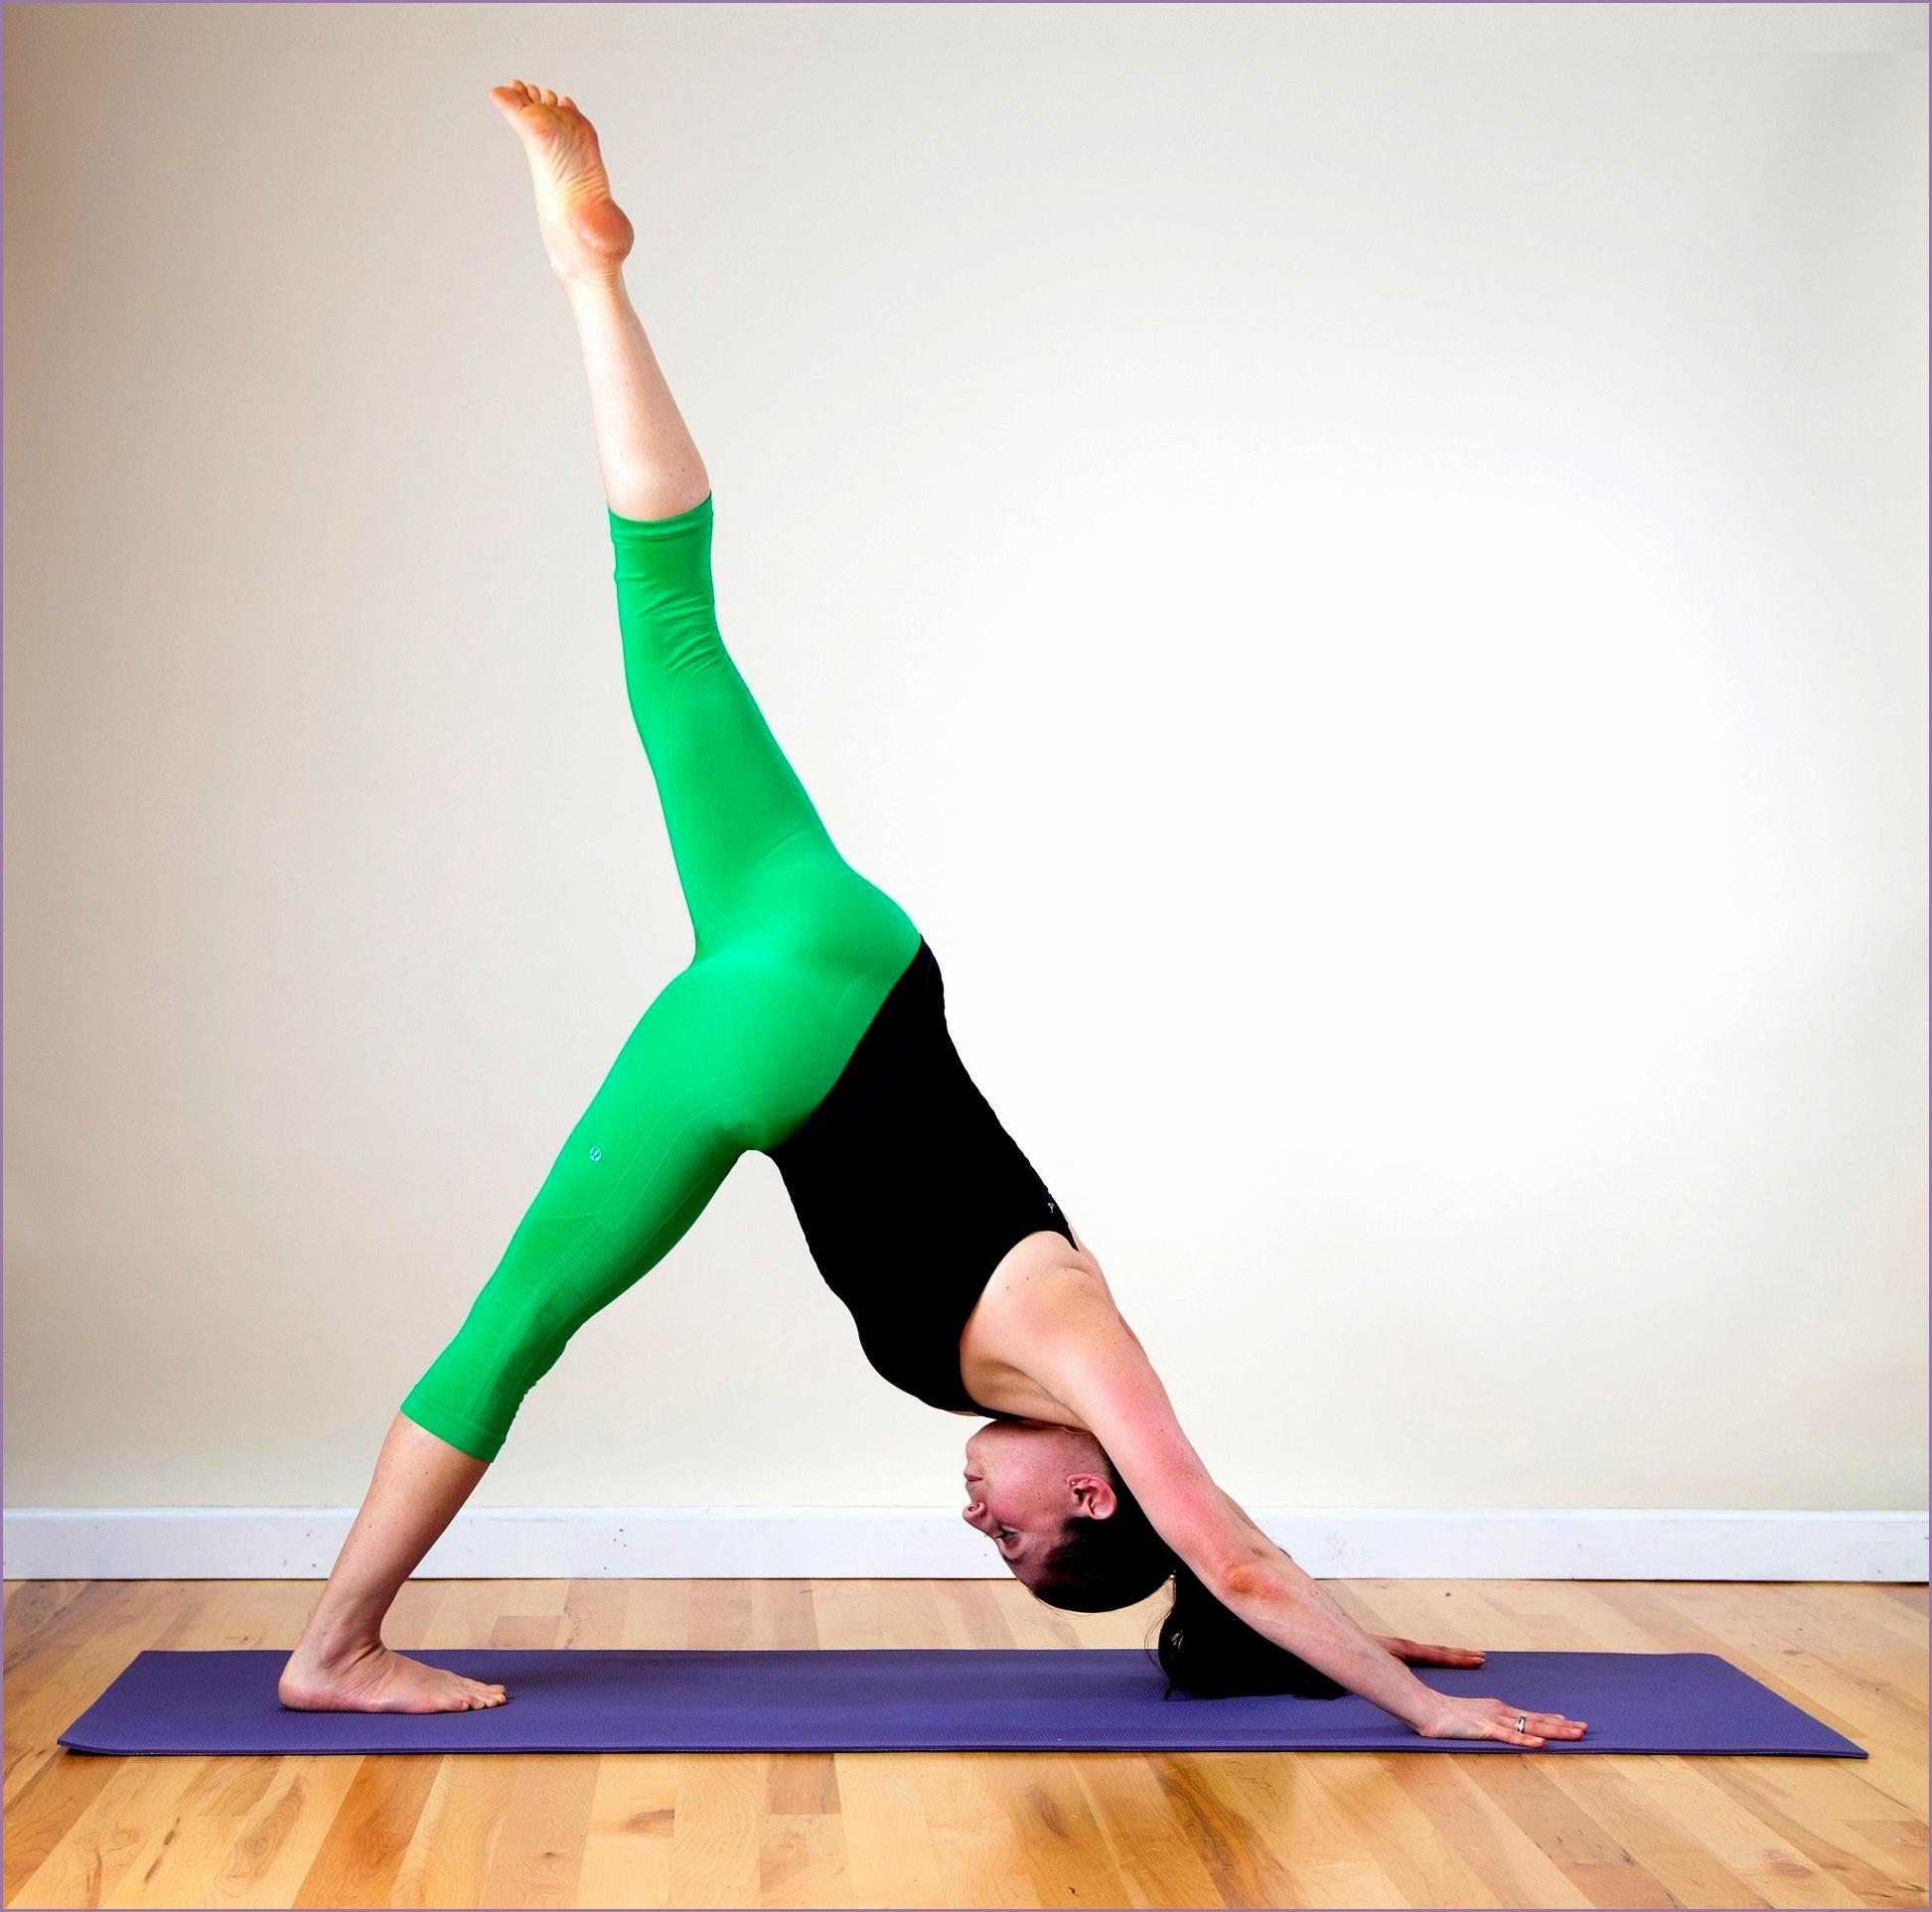 Most mon Yoga Poses